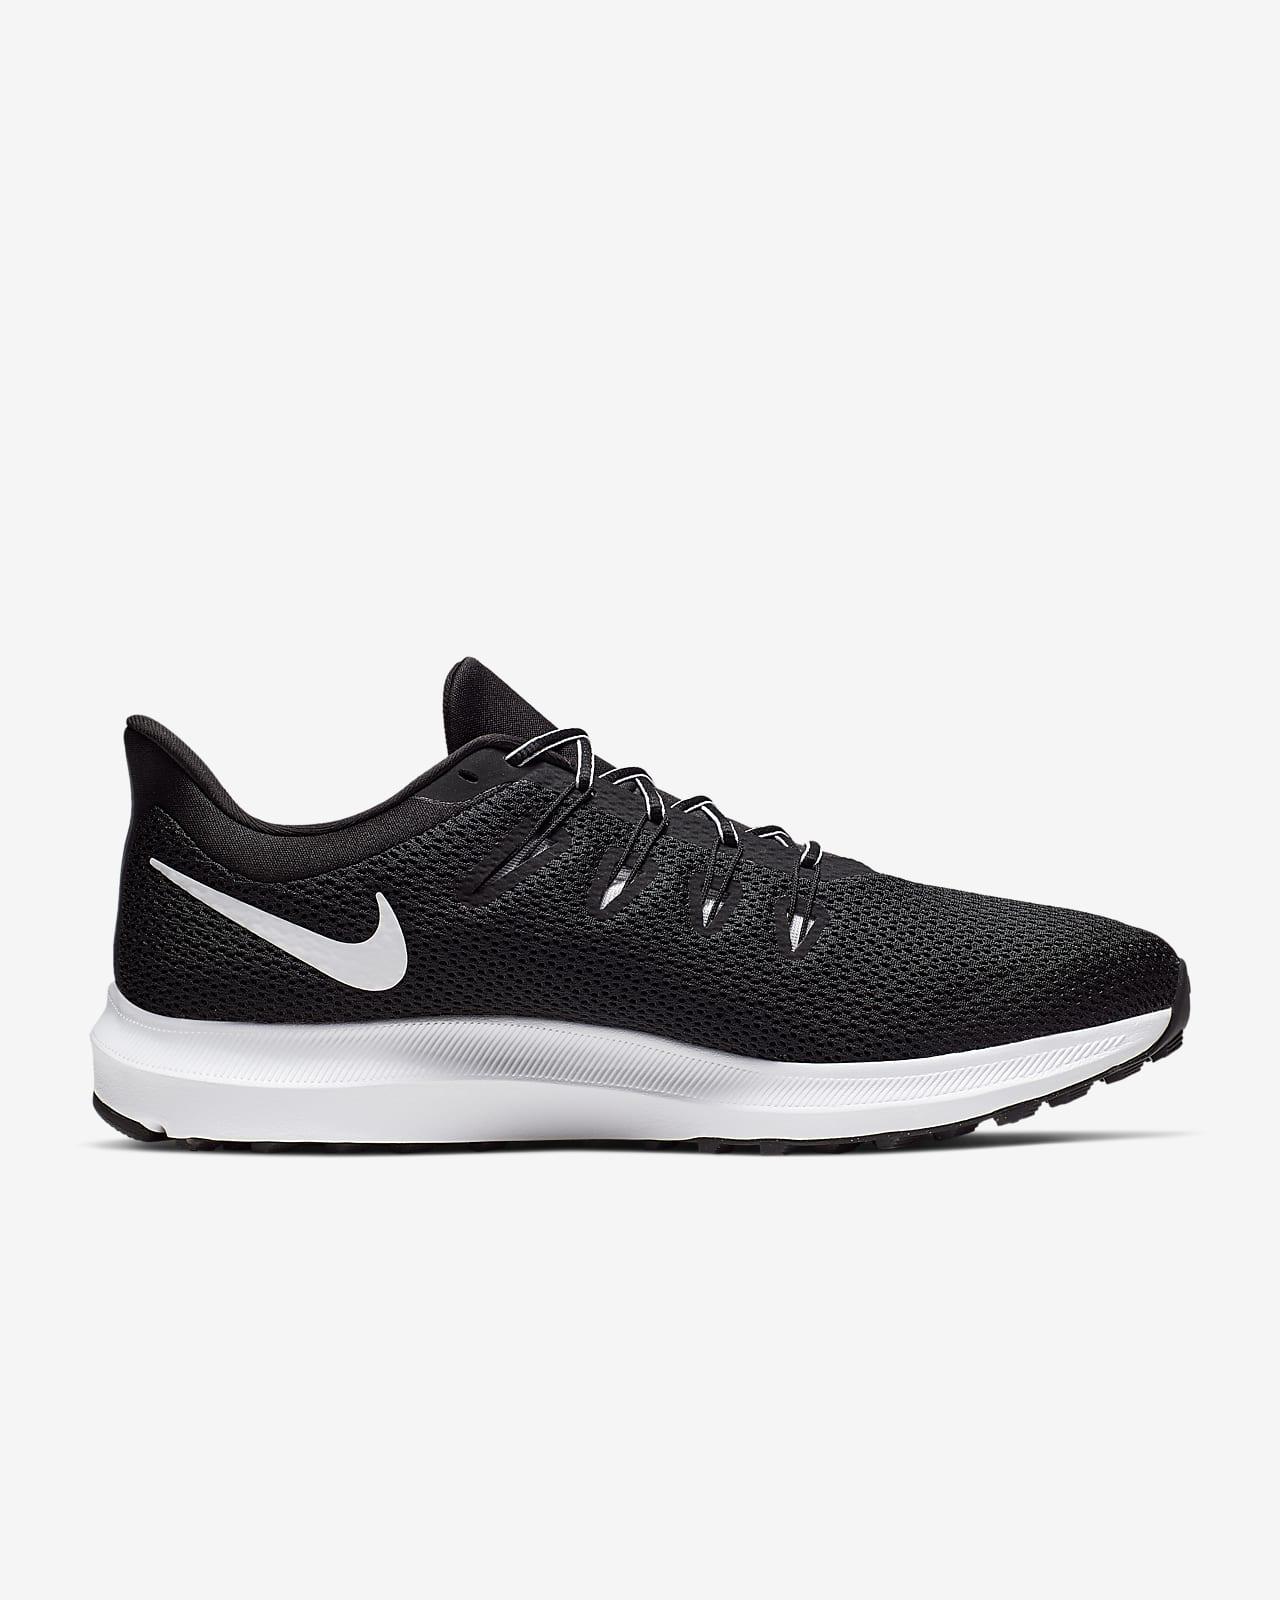 Calzado de running para hombre Nike Quest 2